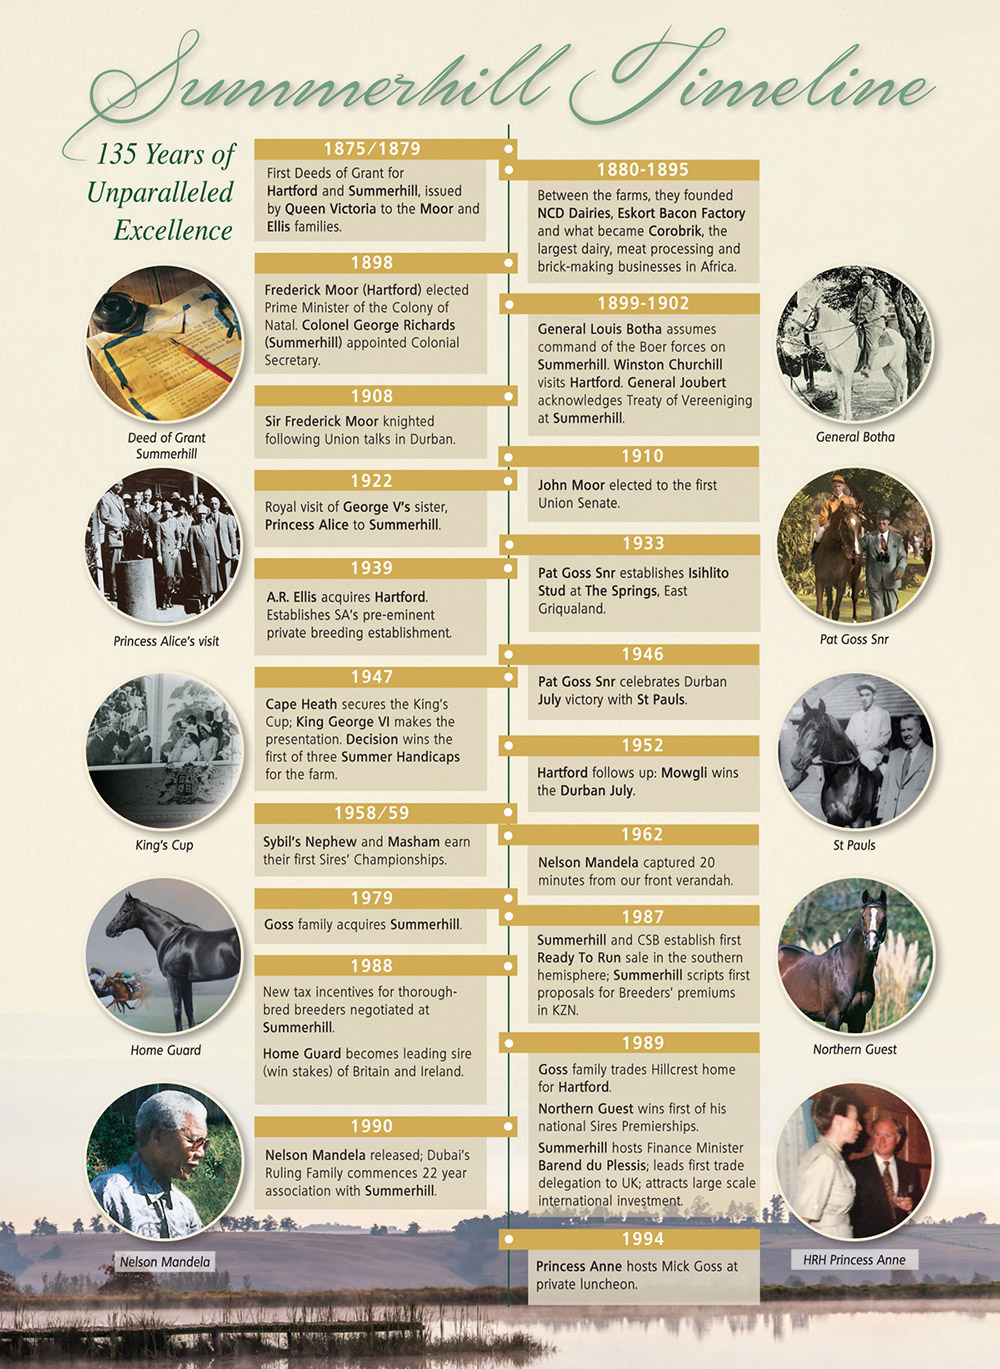 Summerhill Timeline 1875 - 1994